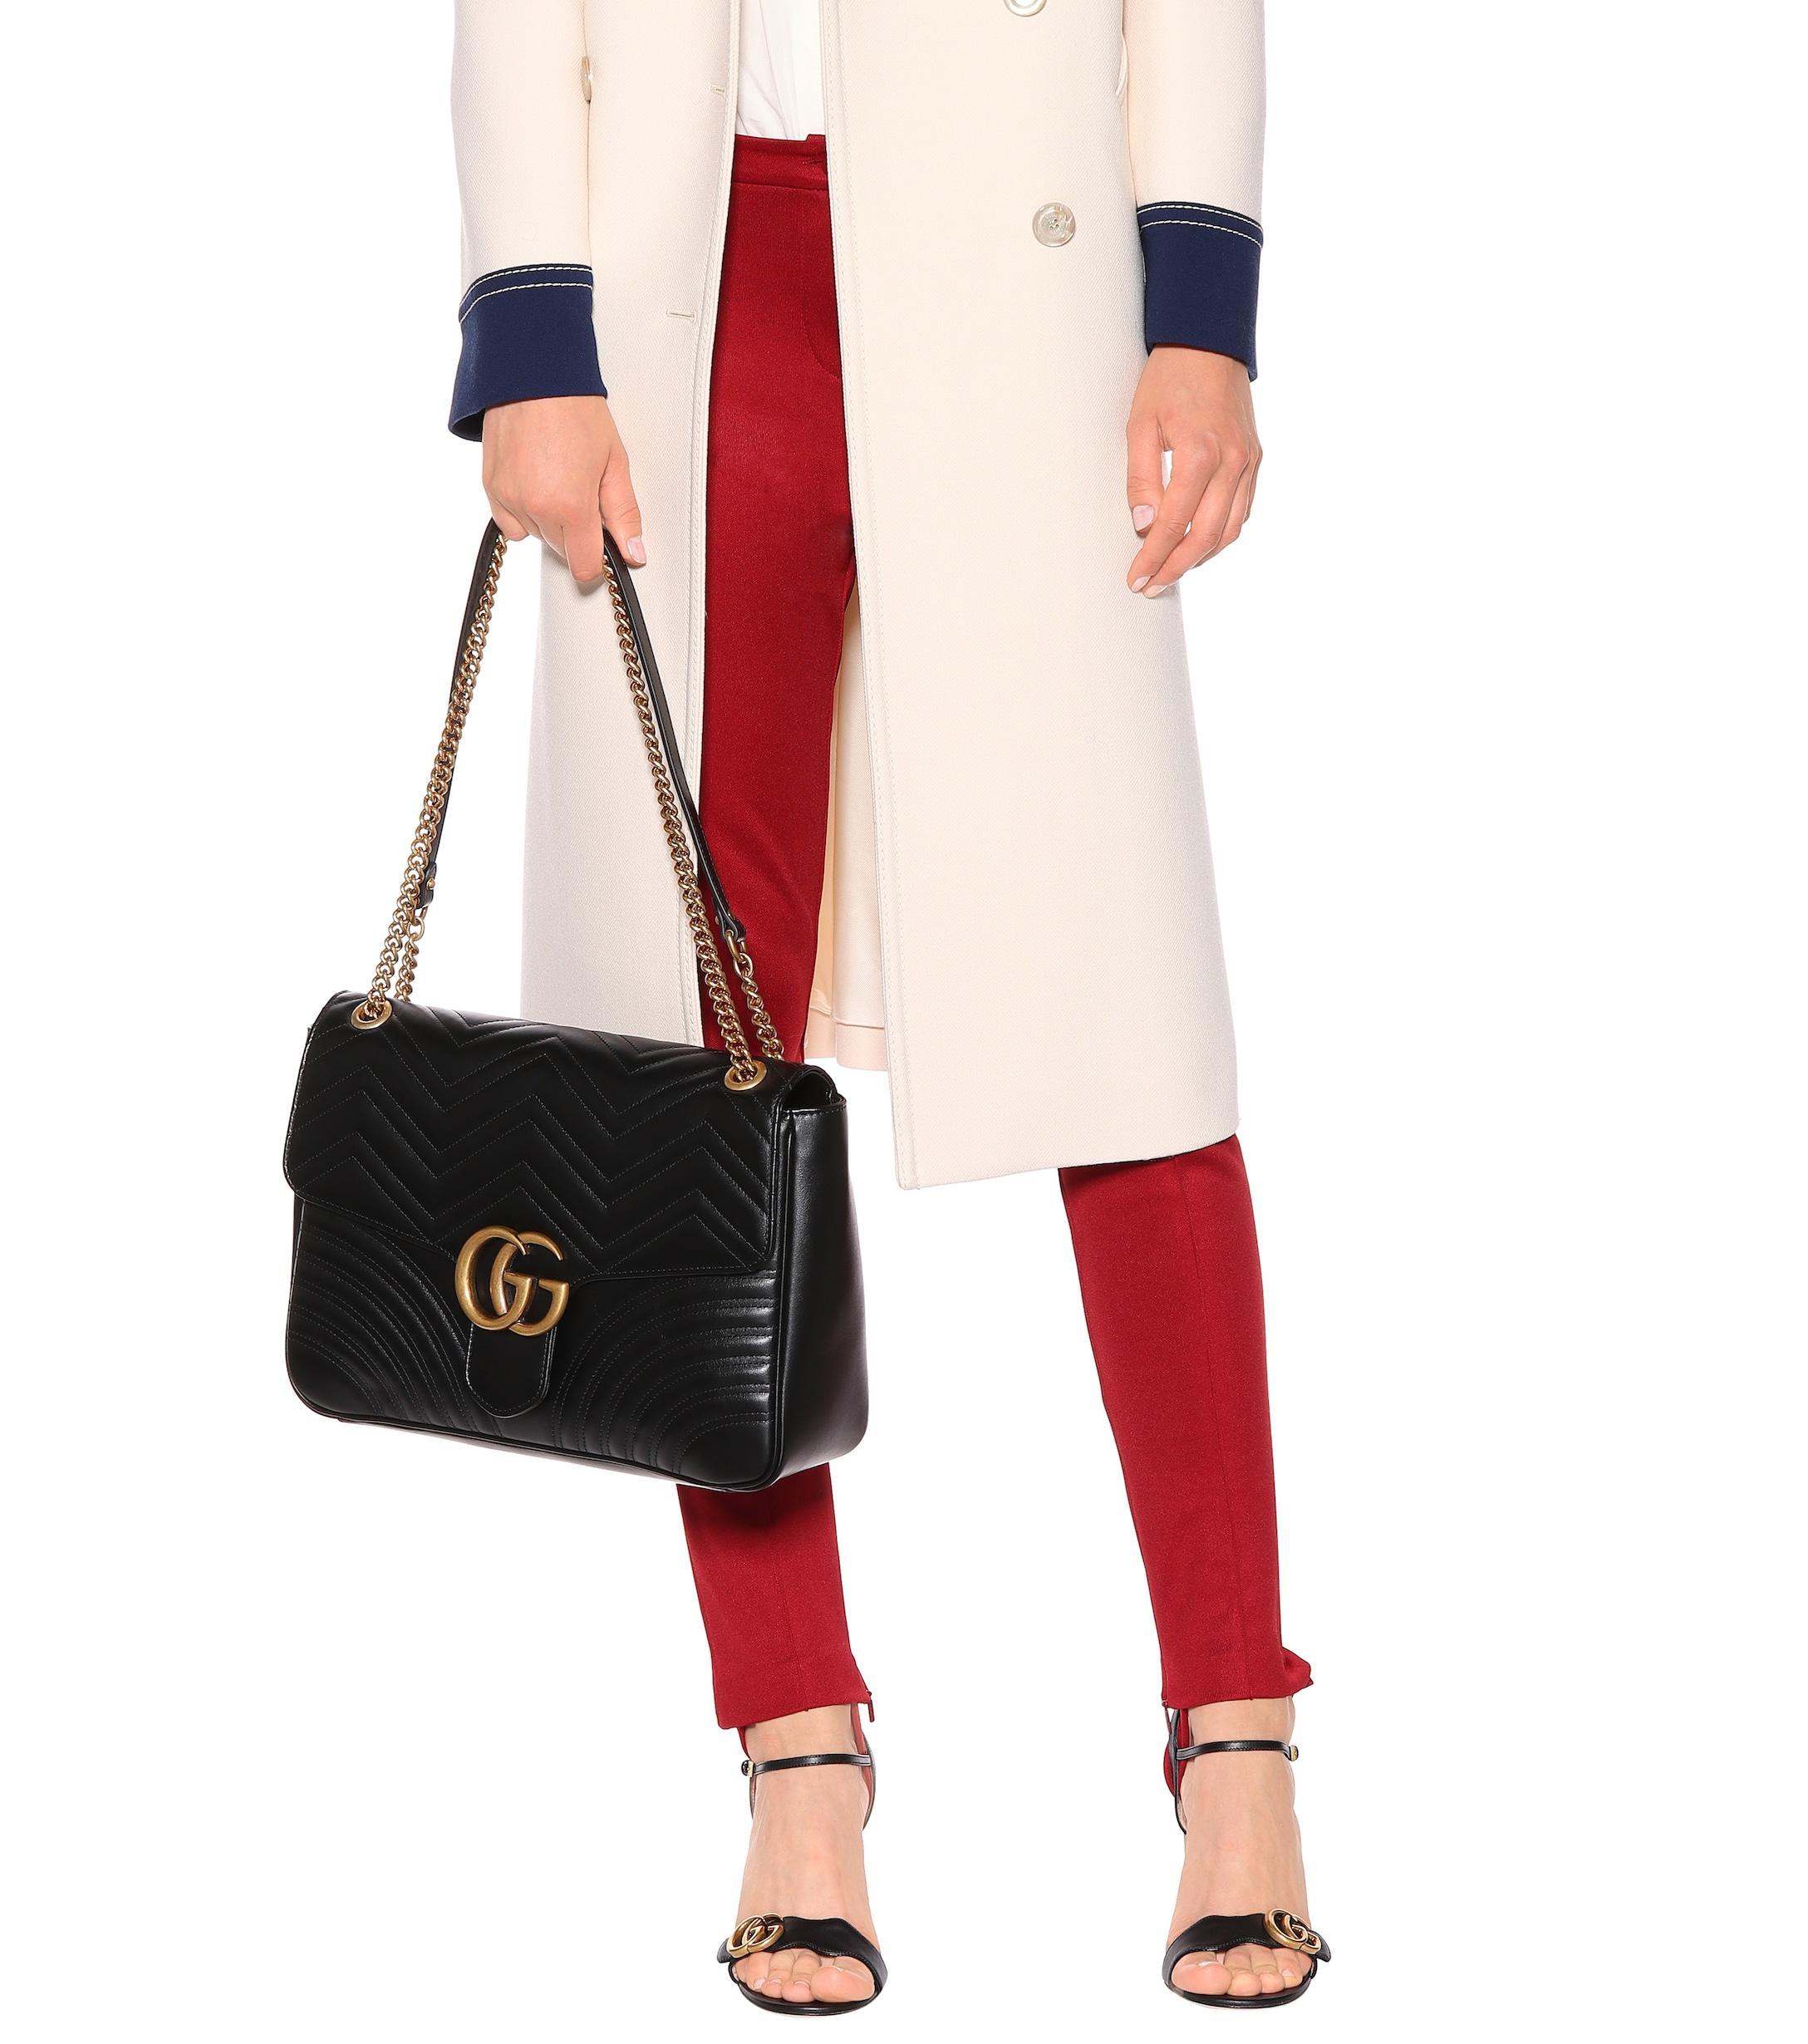 b11b31d043a0 Gucci - Black GG Marmont Large Shoulder Bag - Lyst. View fullscreen